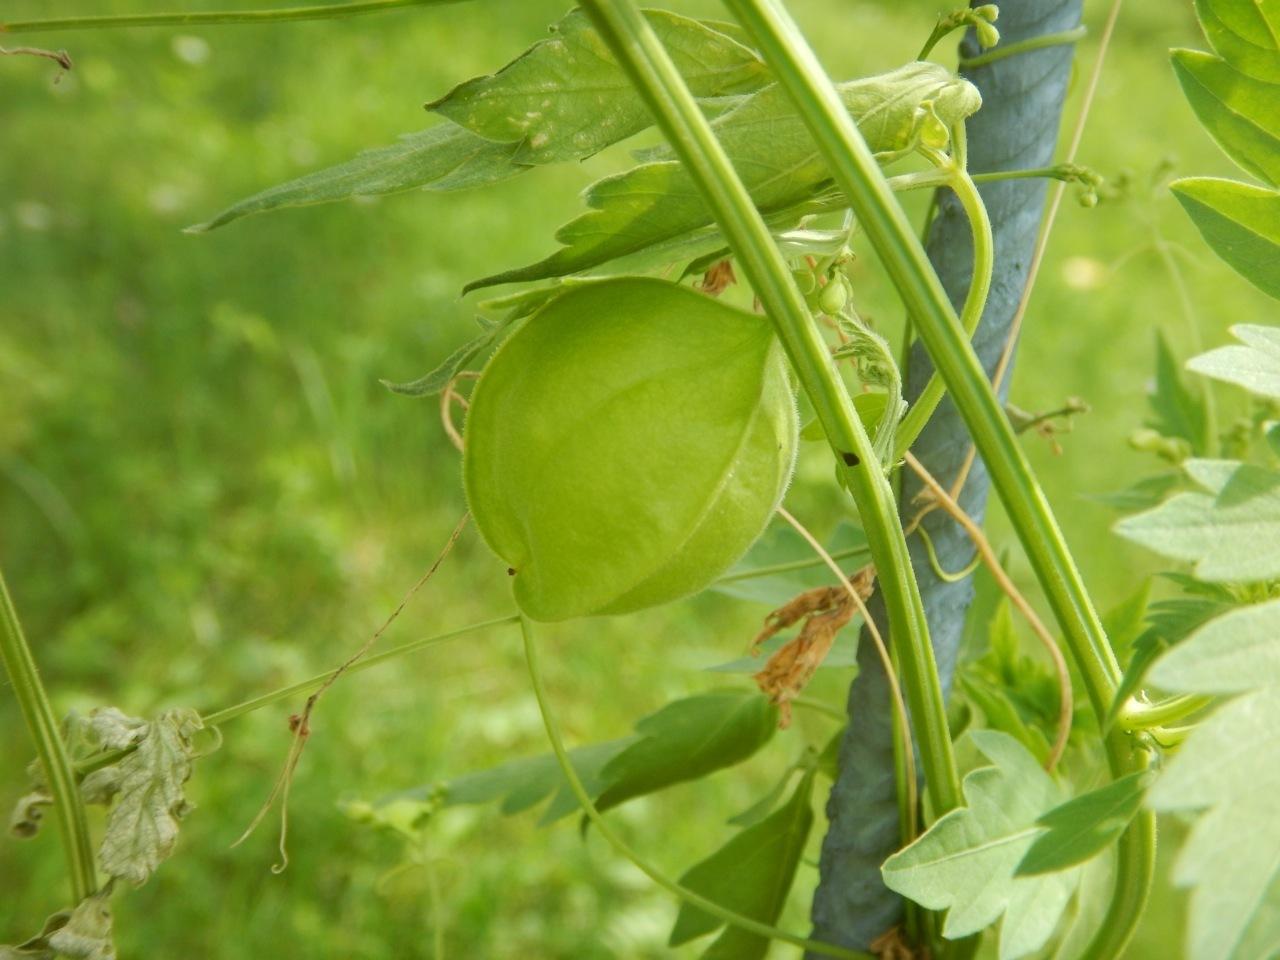 Ballonrebe indische Schlingpflanze Mönchsköpfchen Kanphuti Ballonwein Herzsame